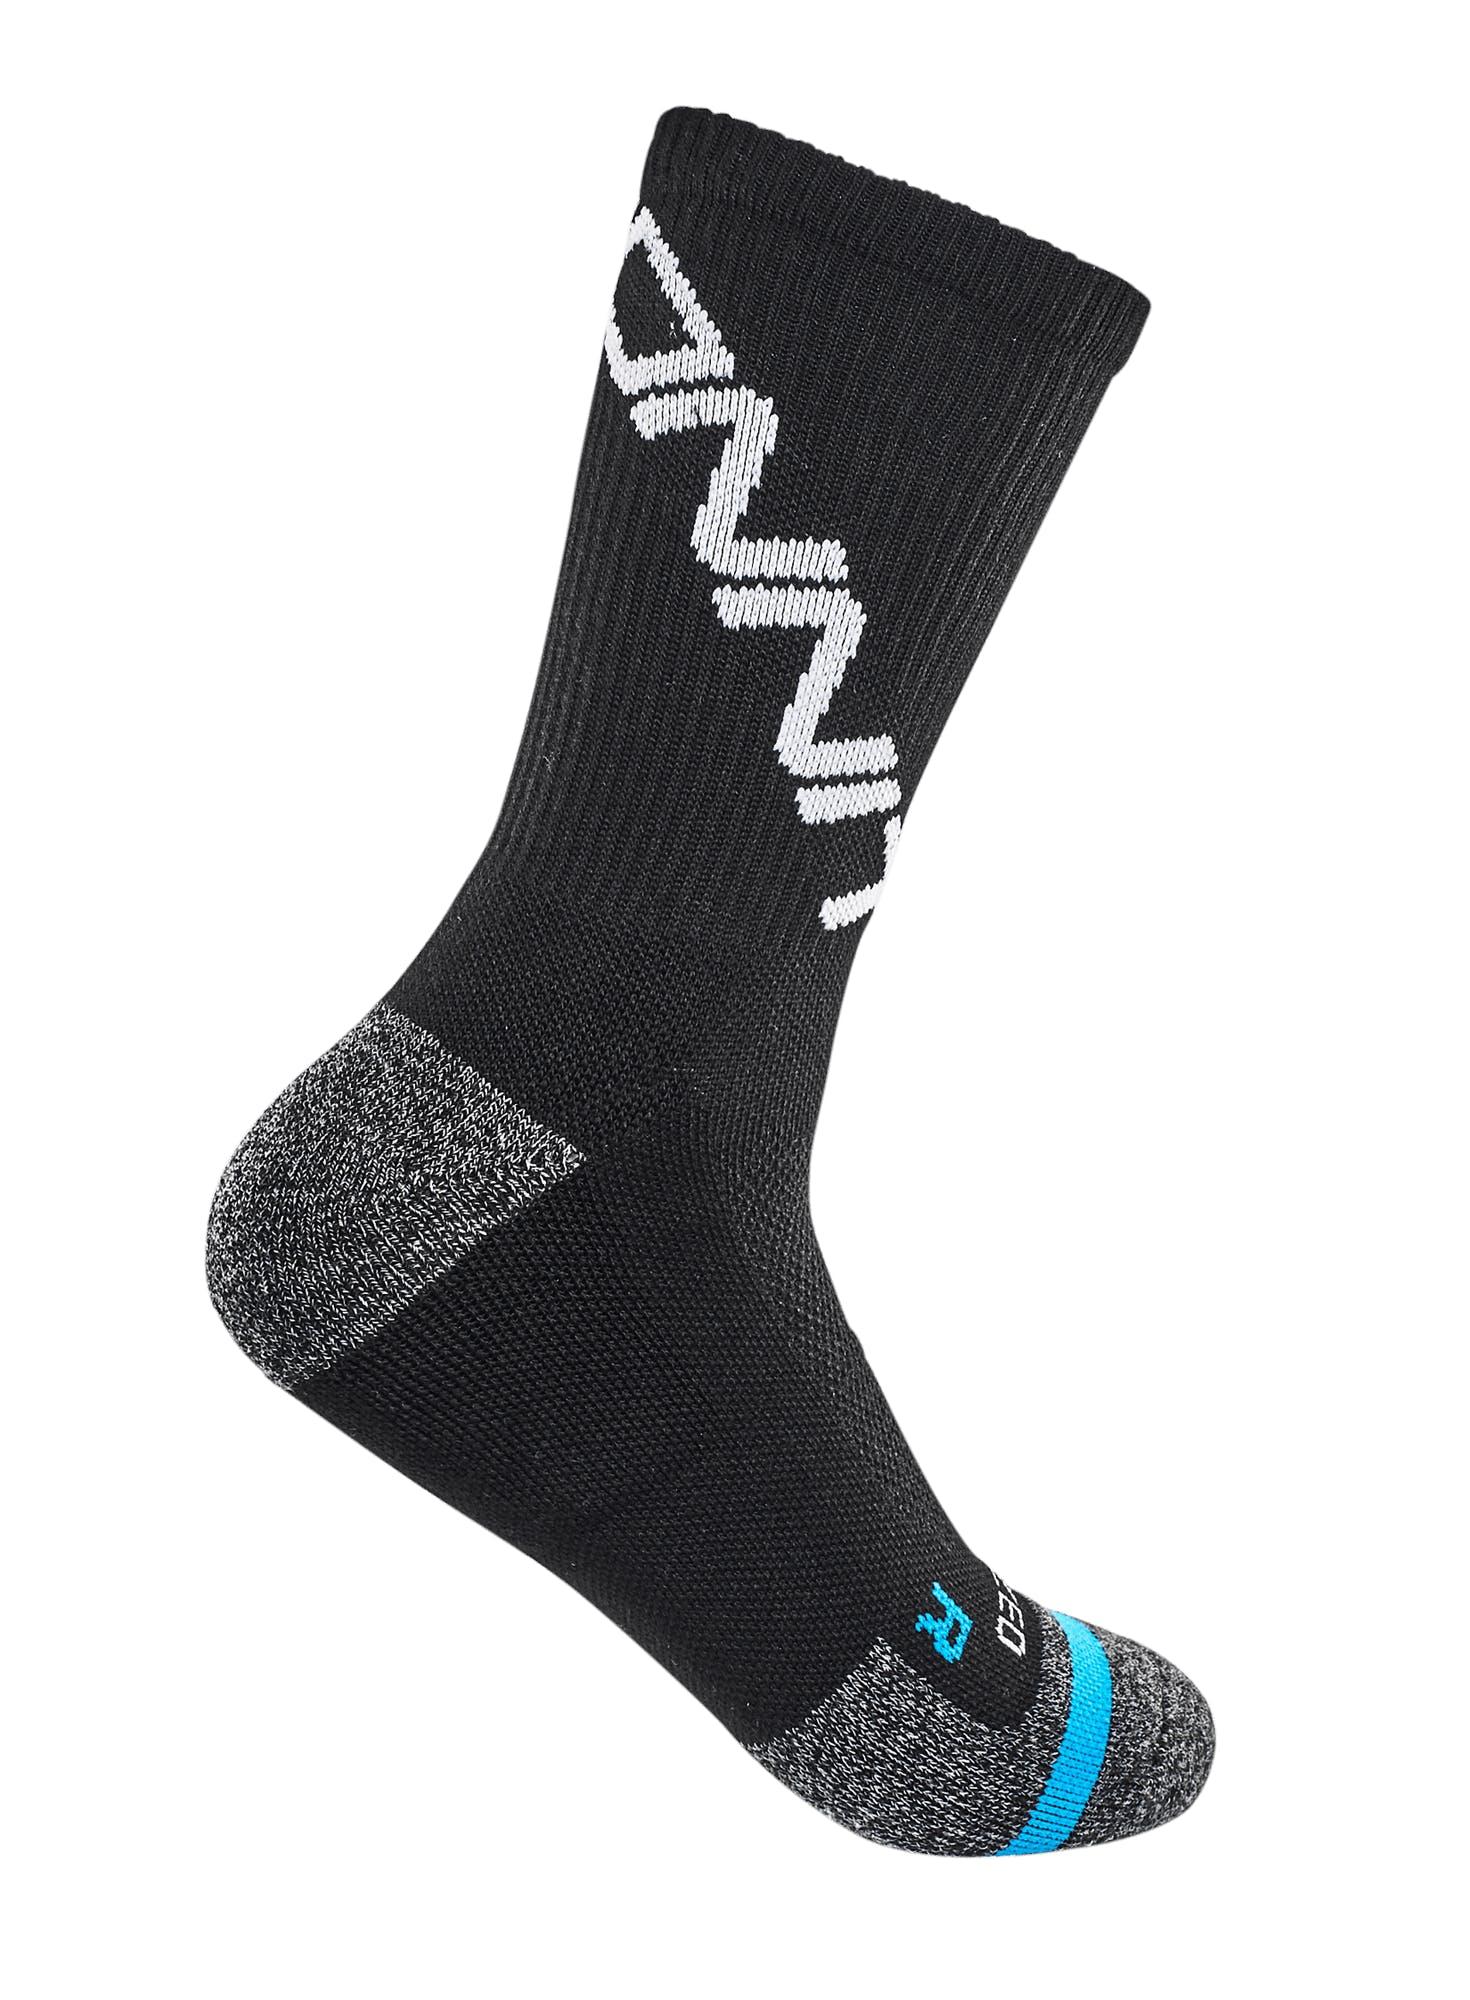 Onnit Type Crew Sock Bonus Image